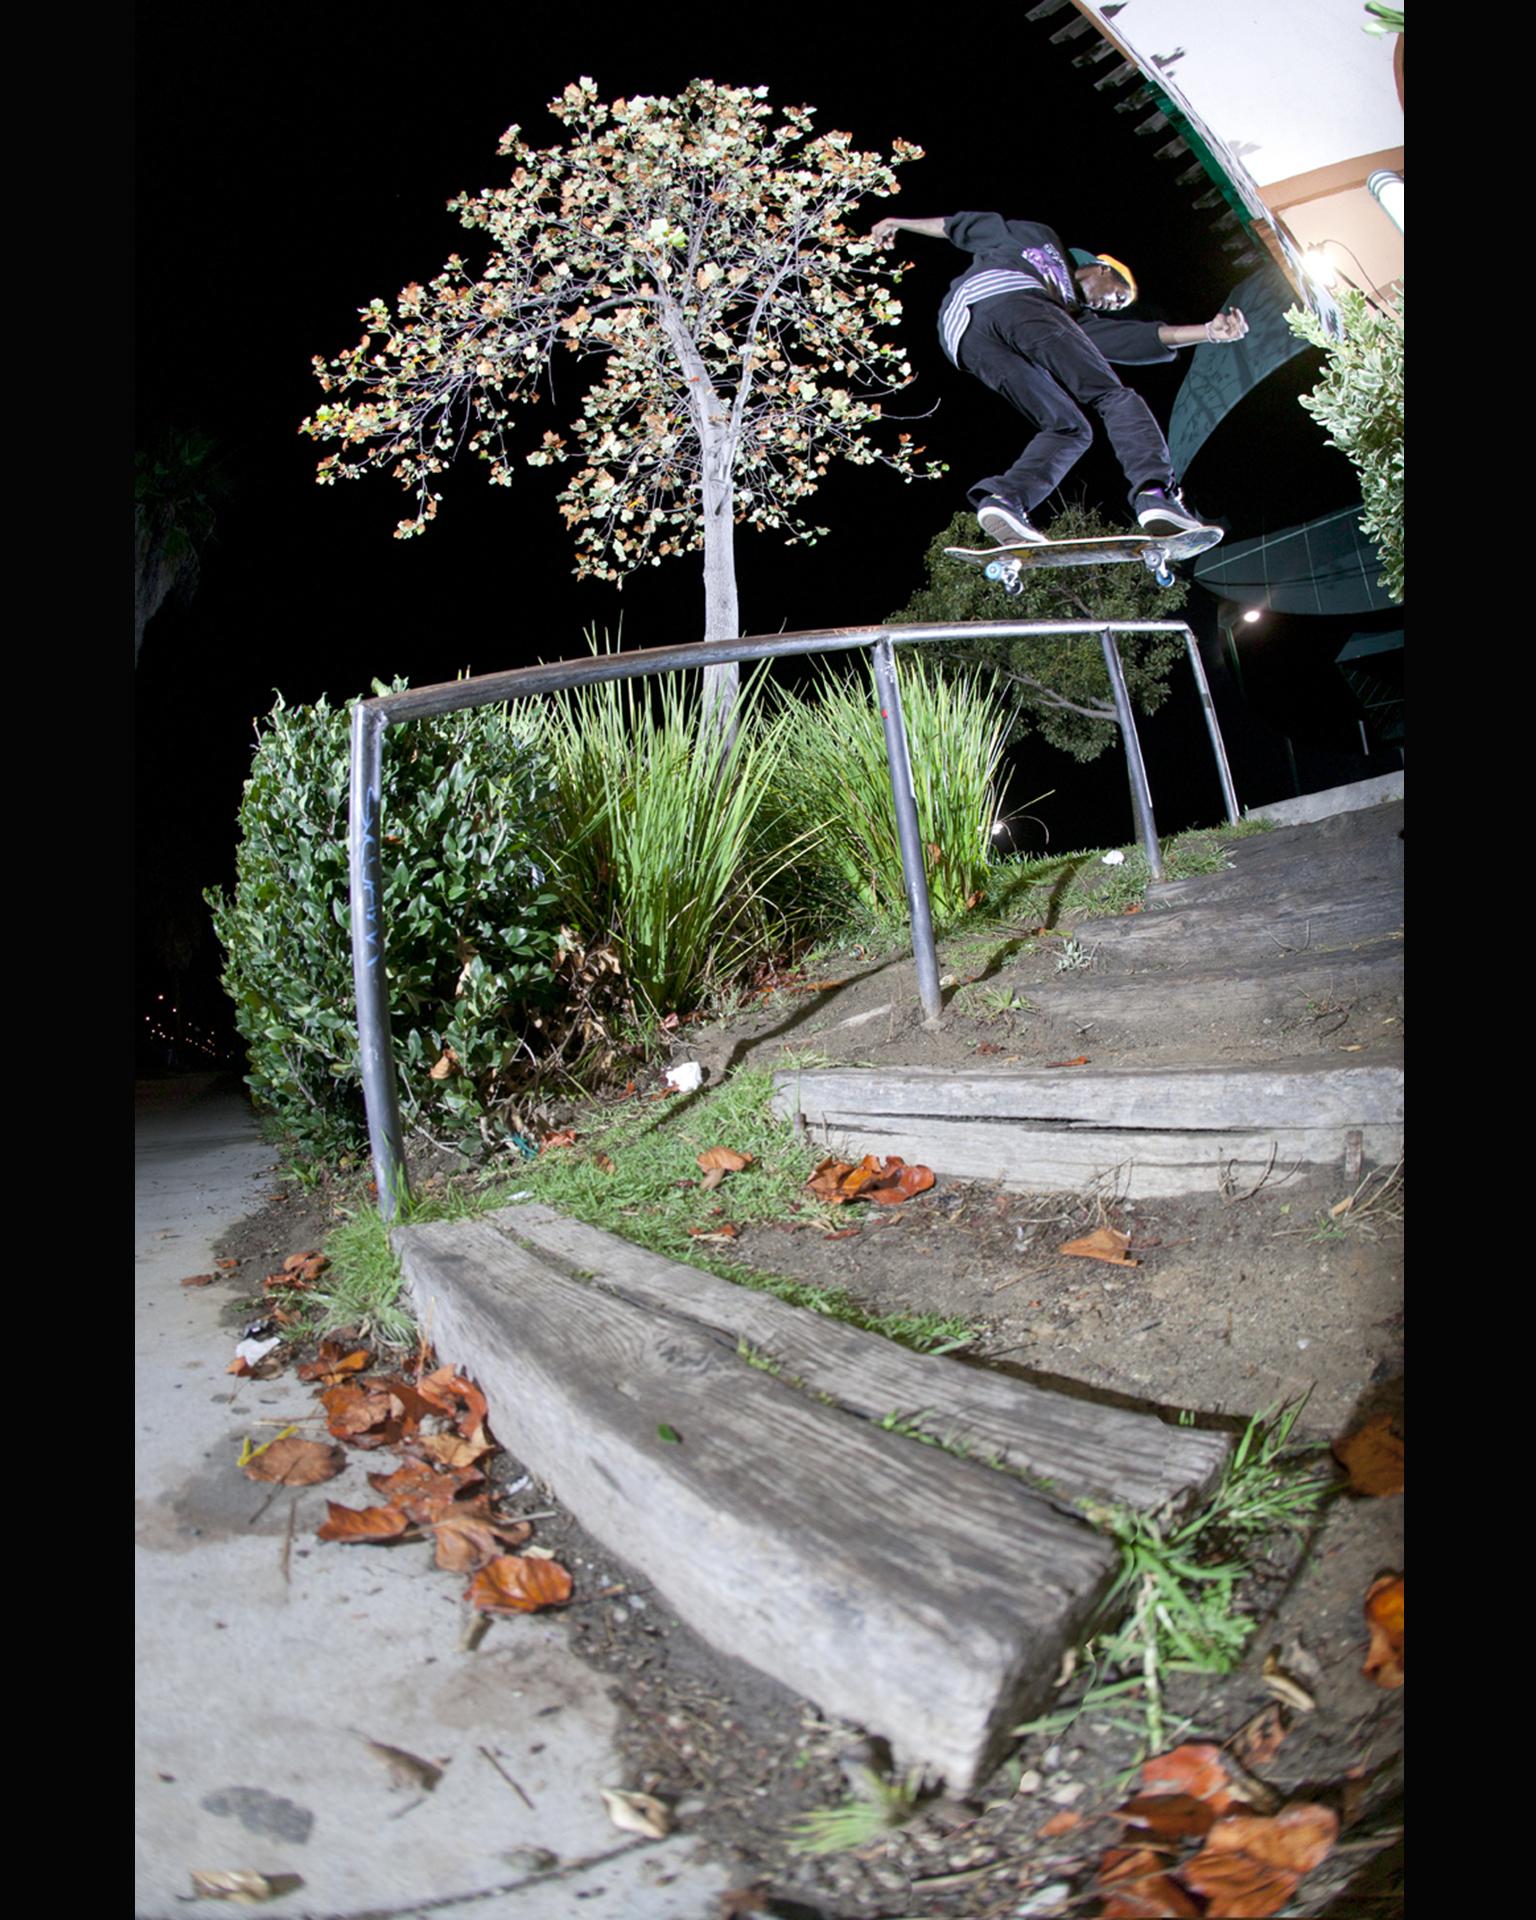 Darrell Stanton, Nollie B/S lipslide